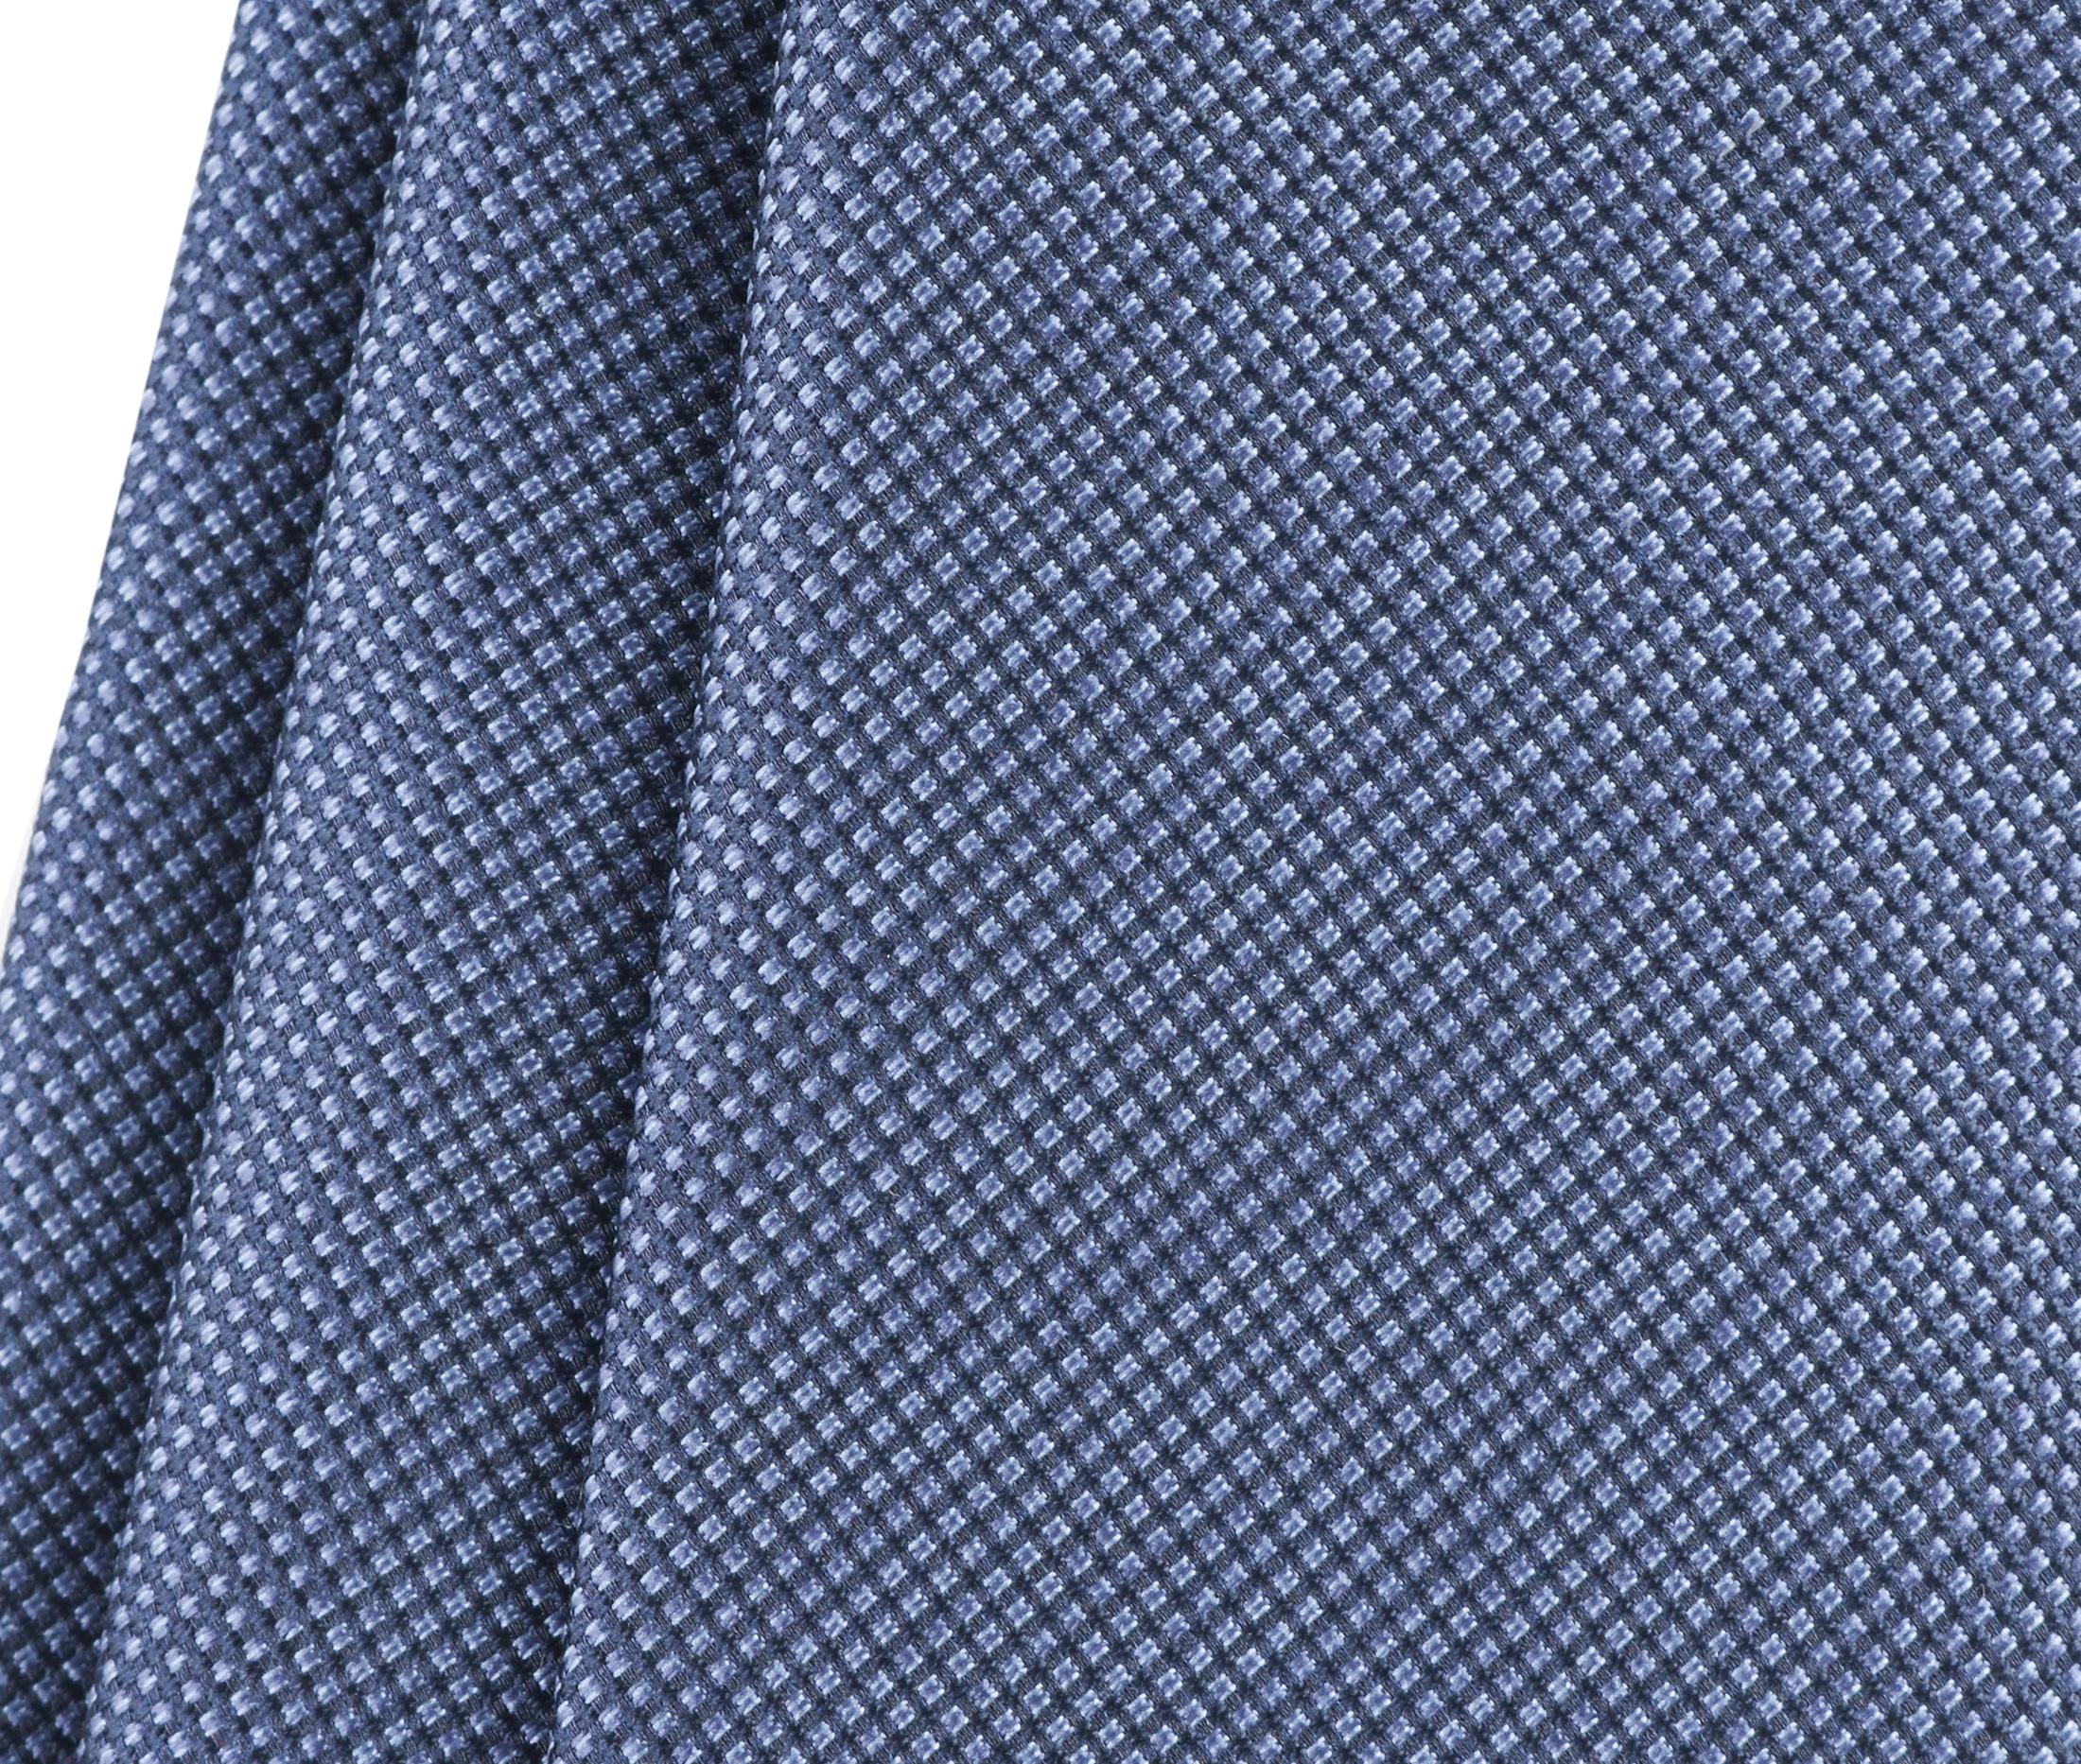 Krawatte Seide Pinpoint Dunkeblau 9-17 foto 2